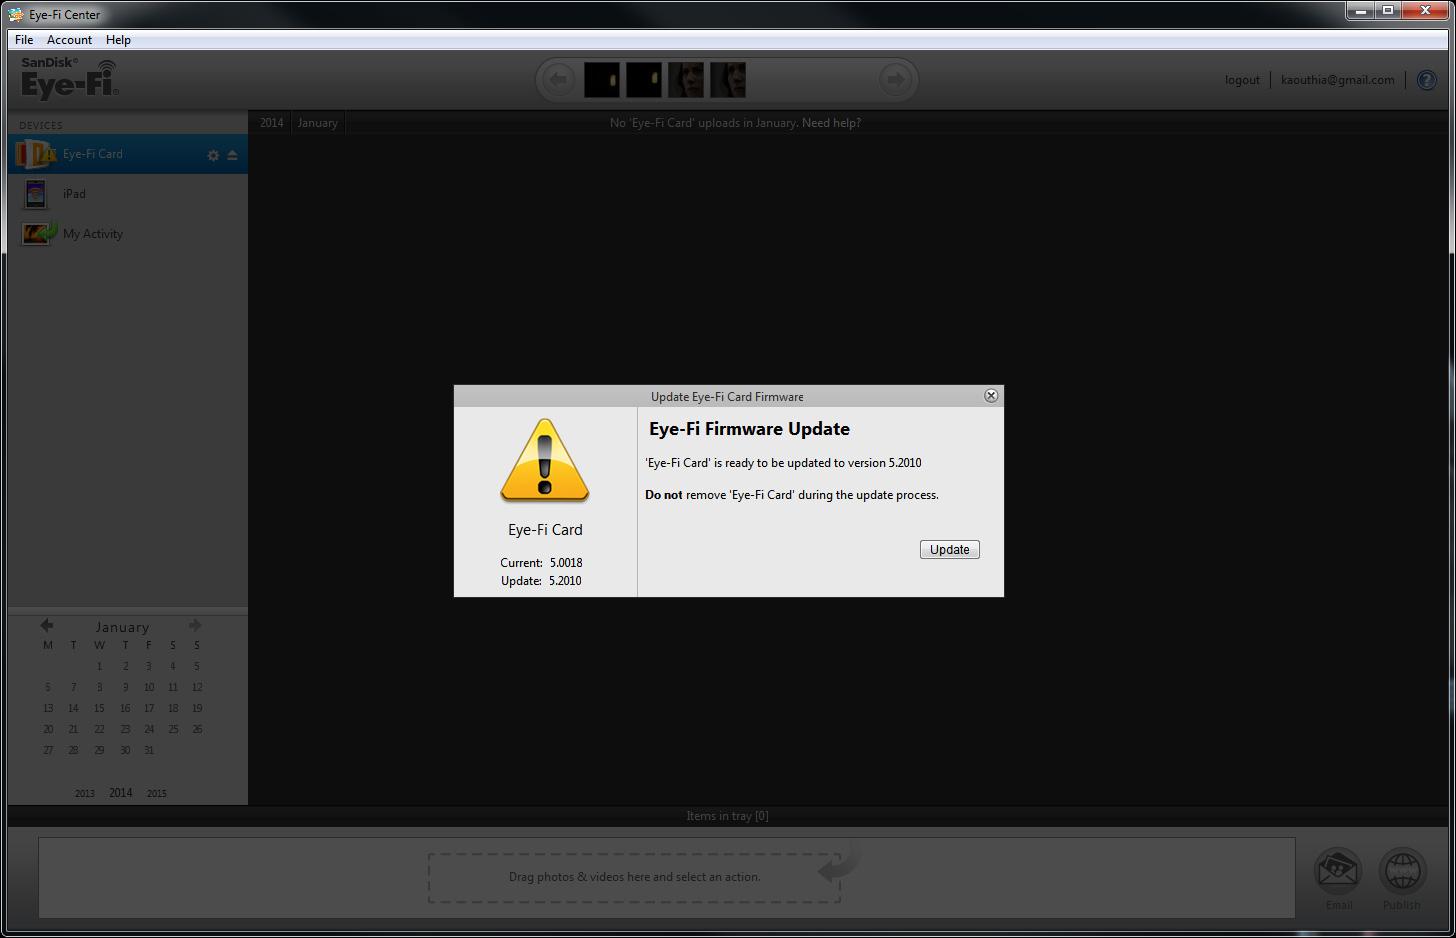 eyefi_firmware_update